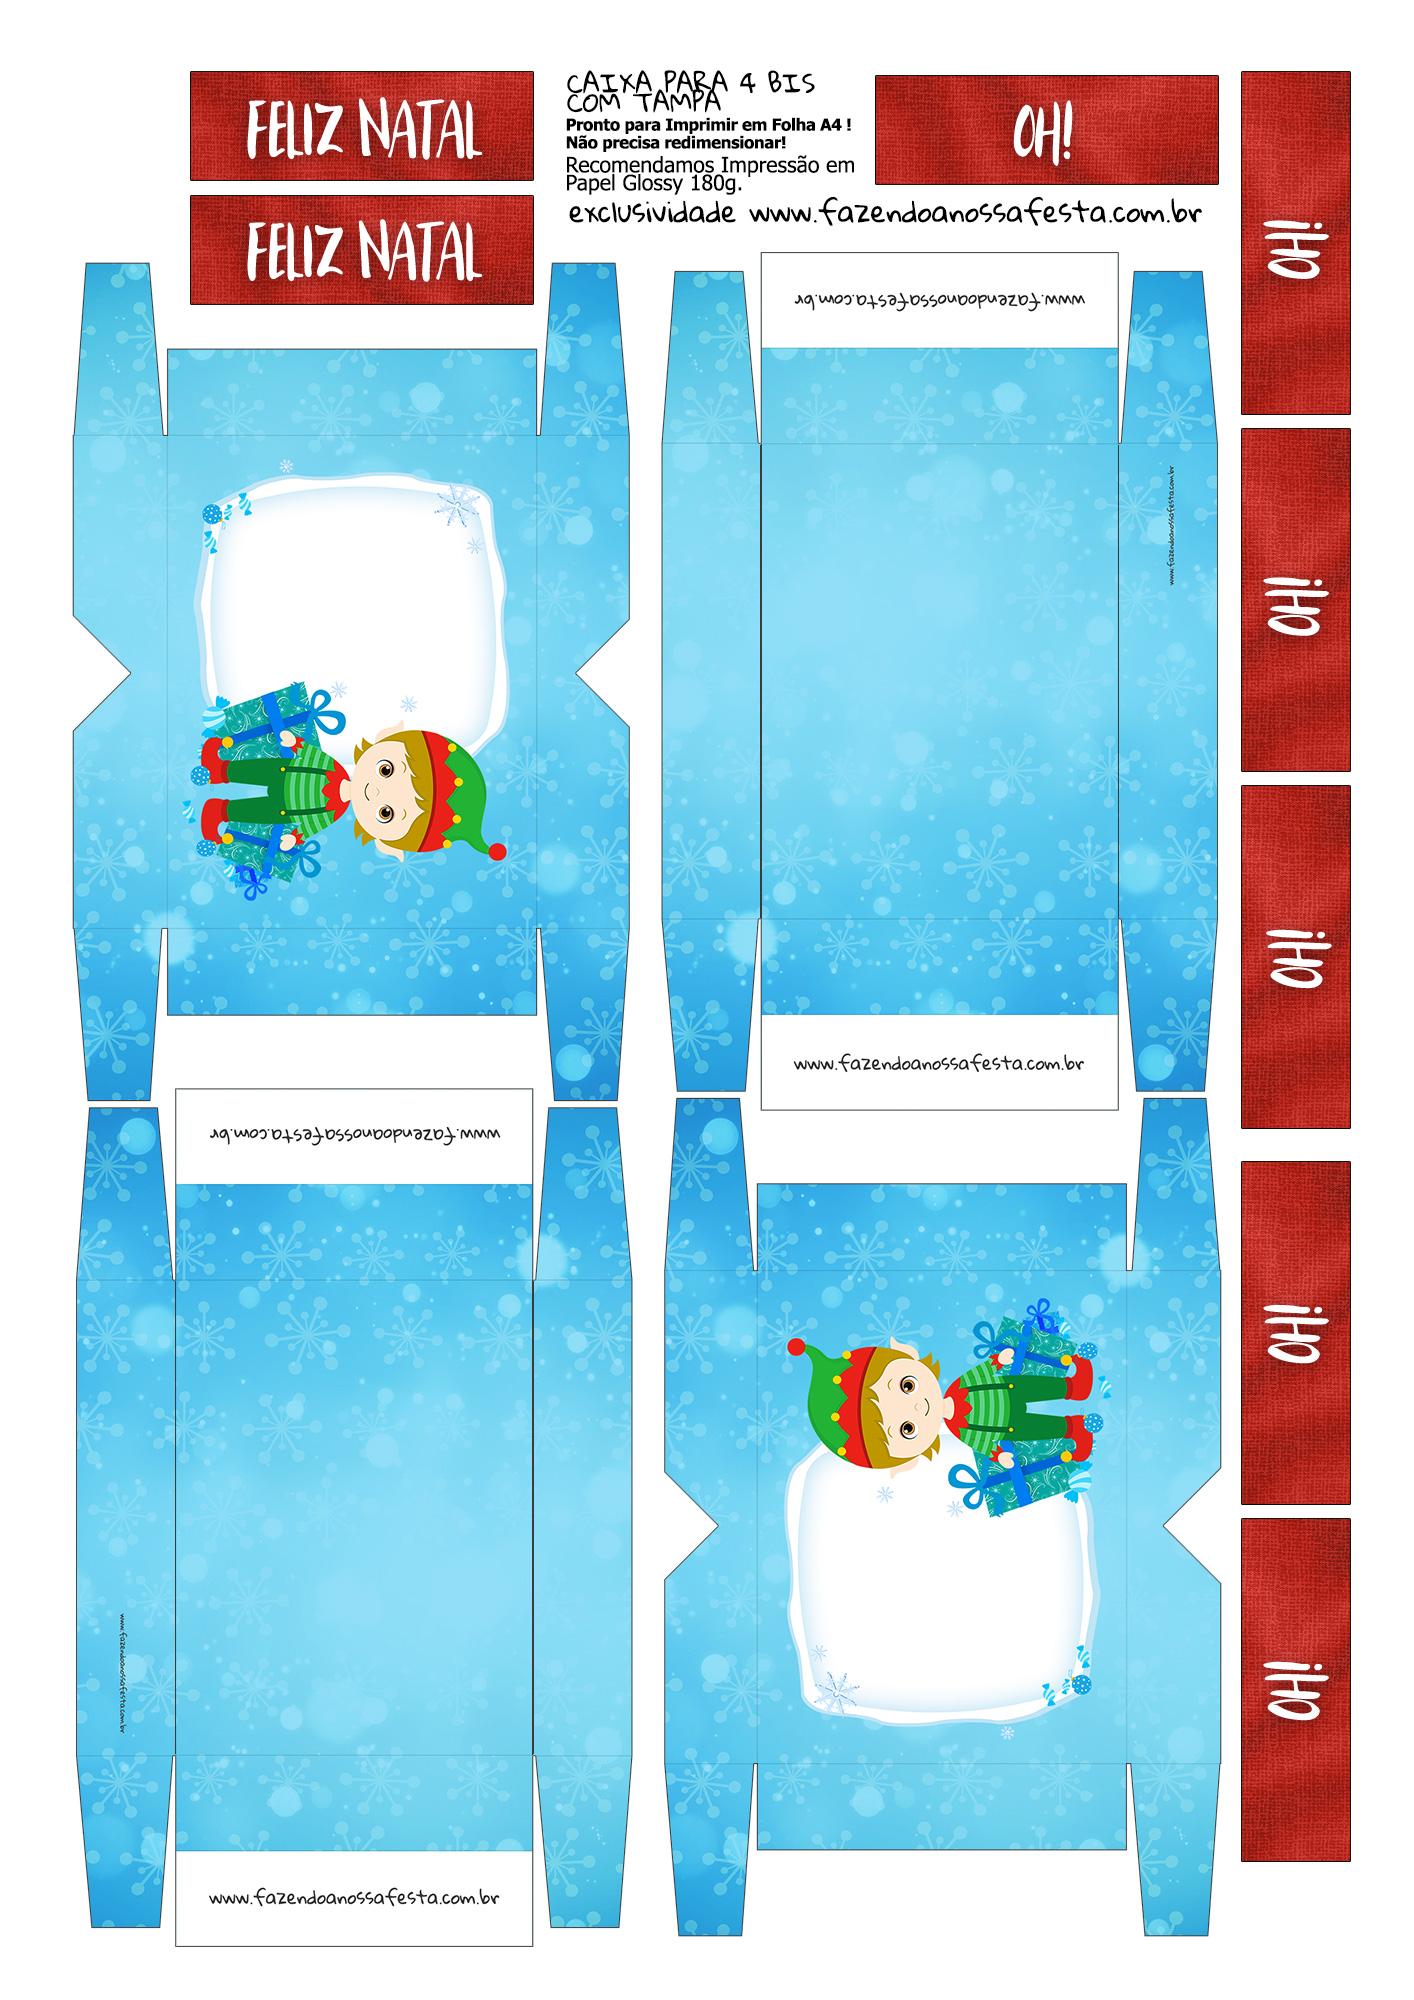 Lembrancinha para Natal Caixa 4 Bis 6